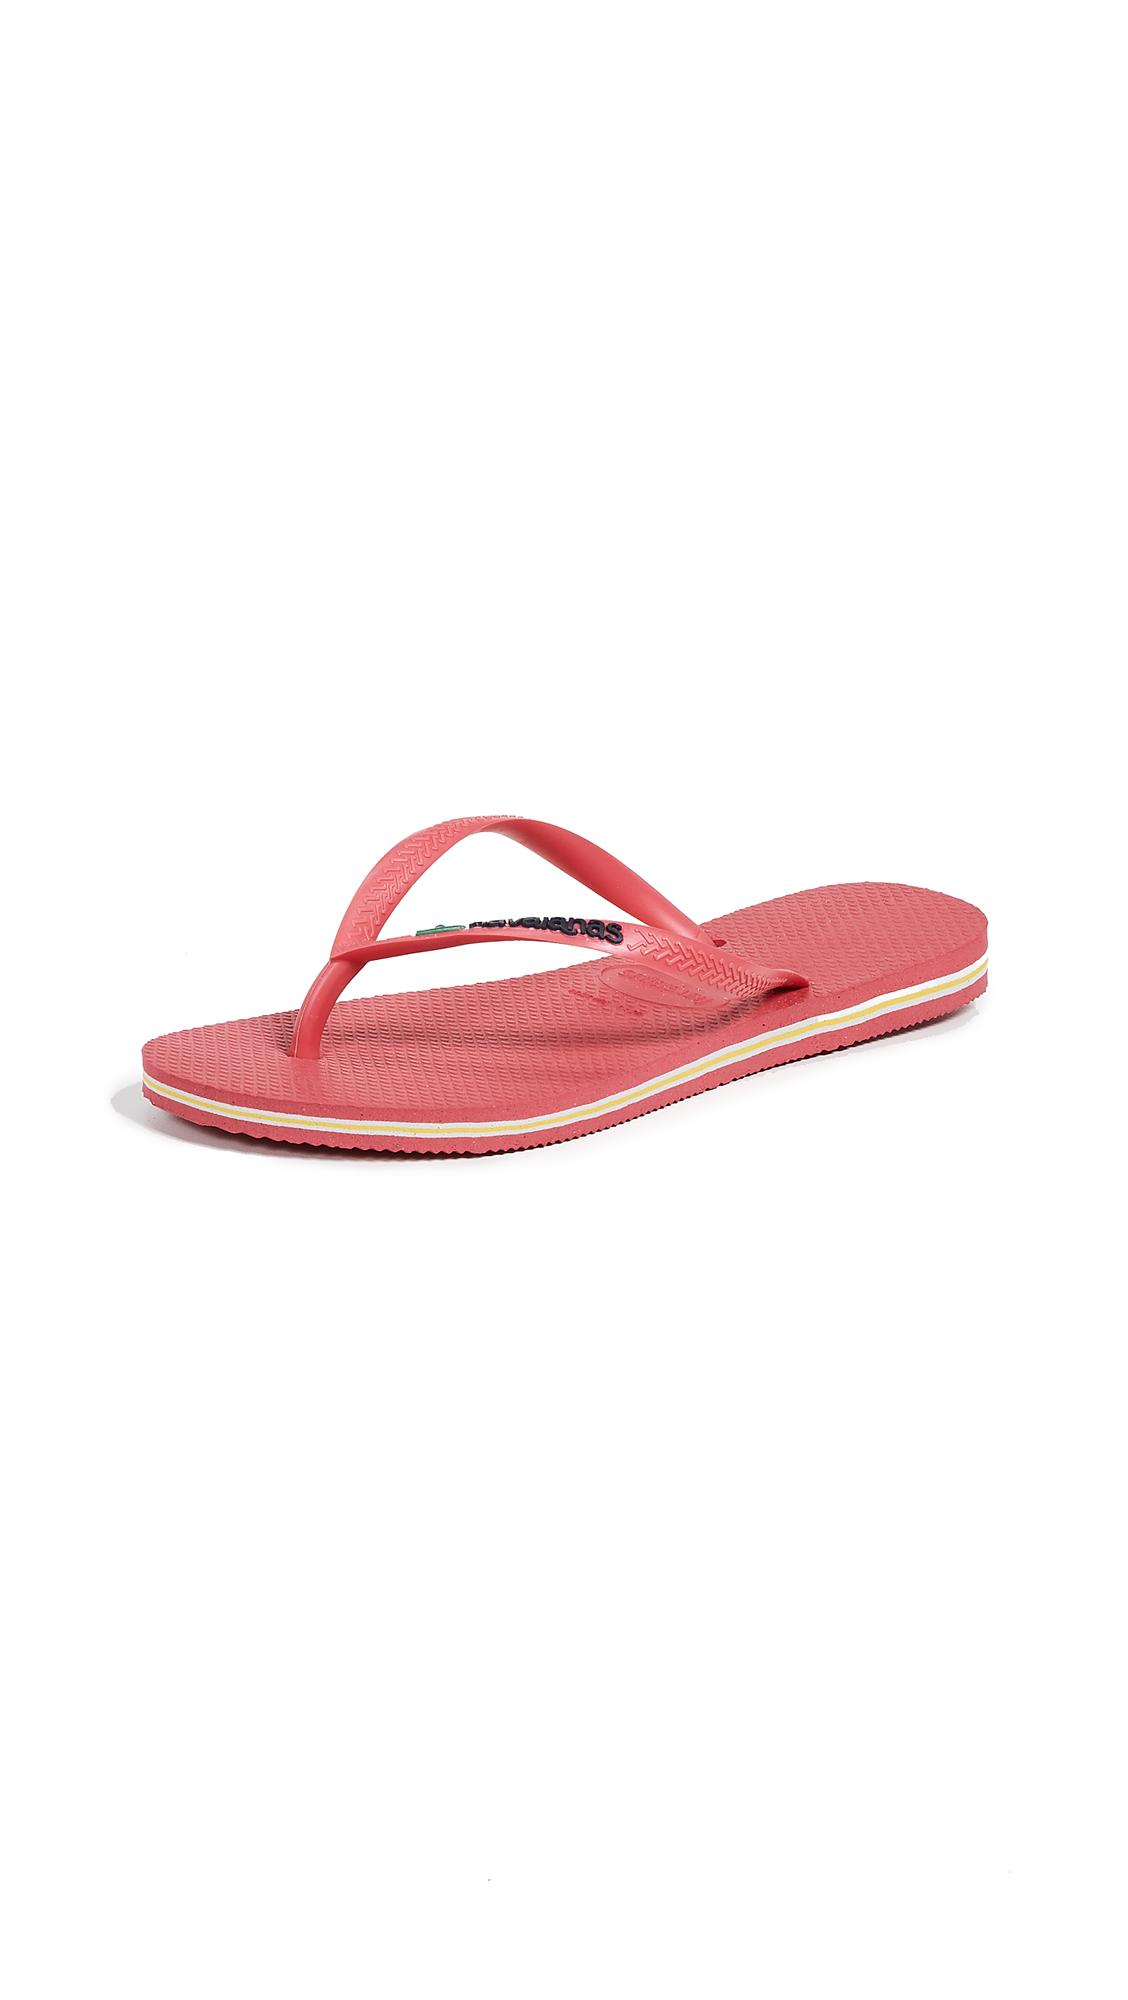 Havaianas Slim Brazil Flip Flops - Flamingo